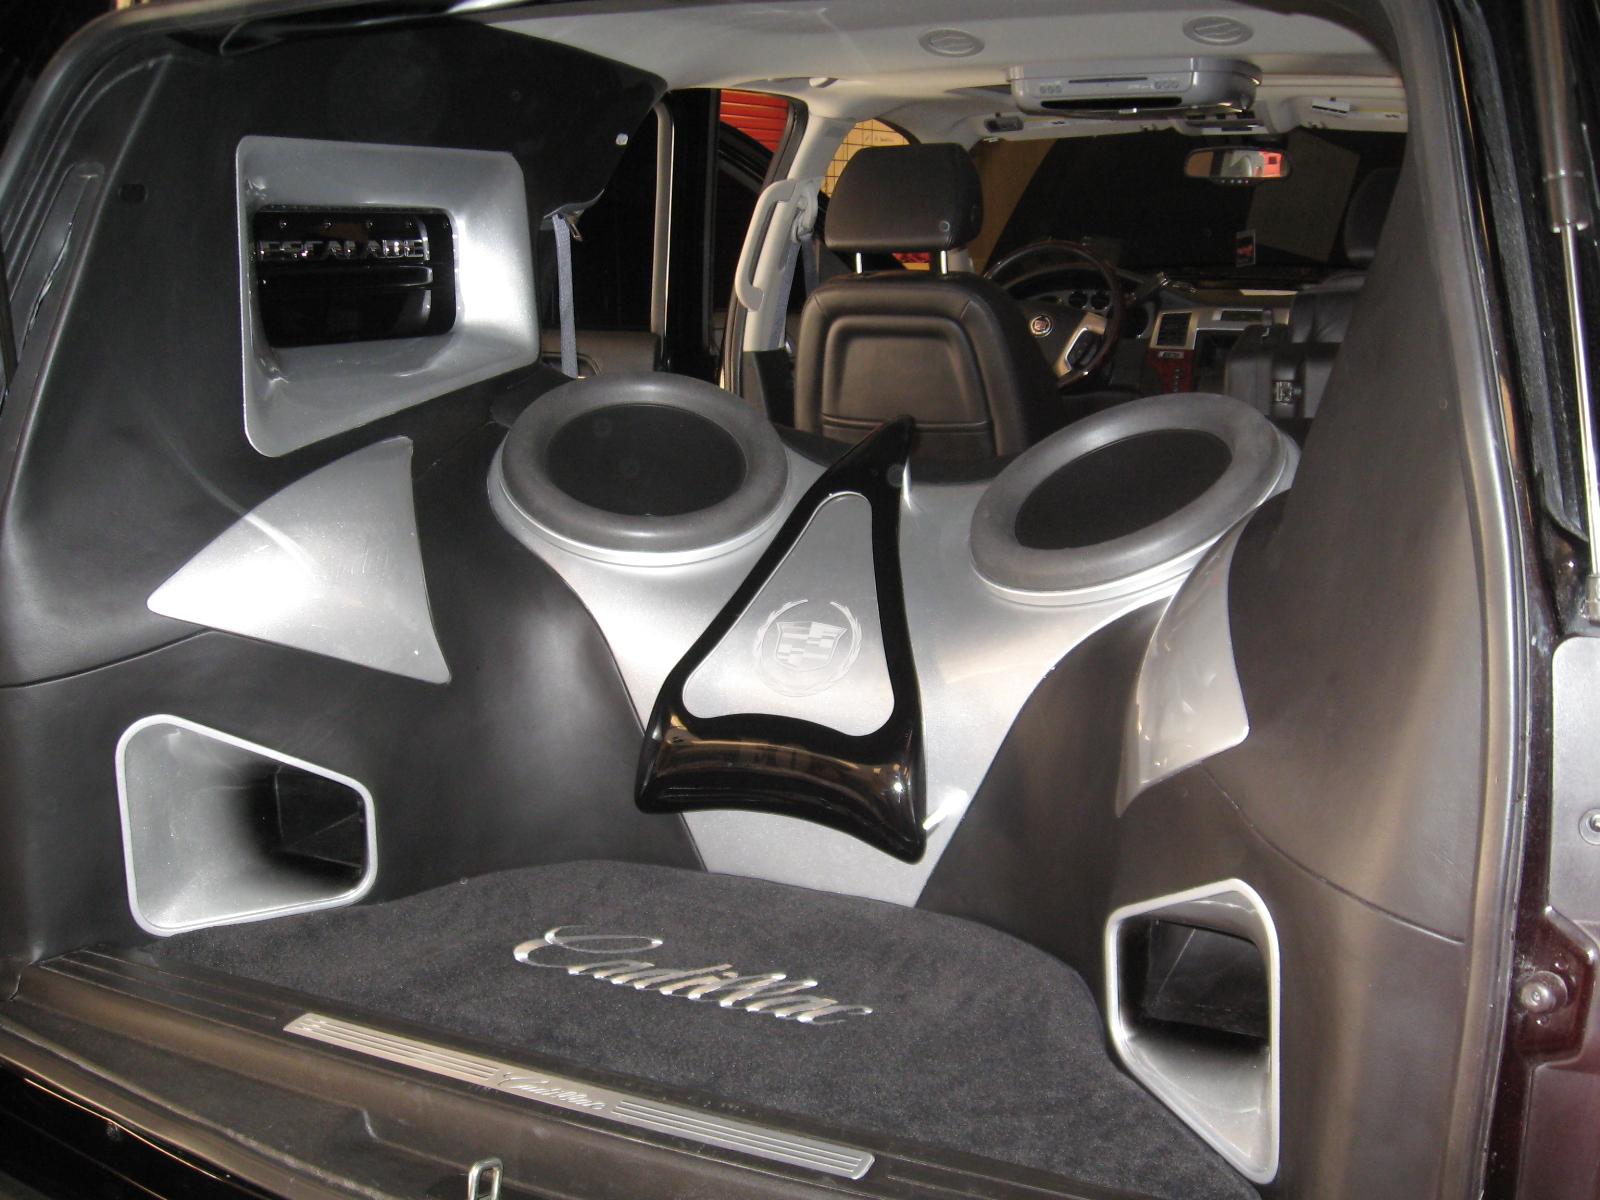 How to design a car audio system